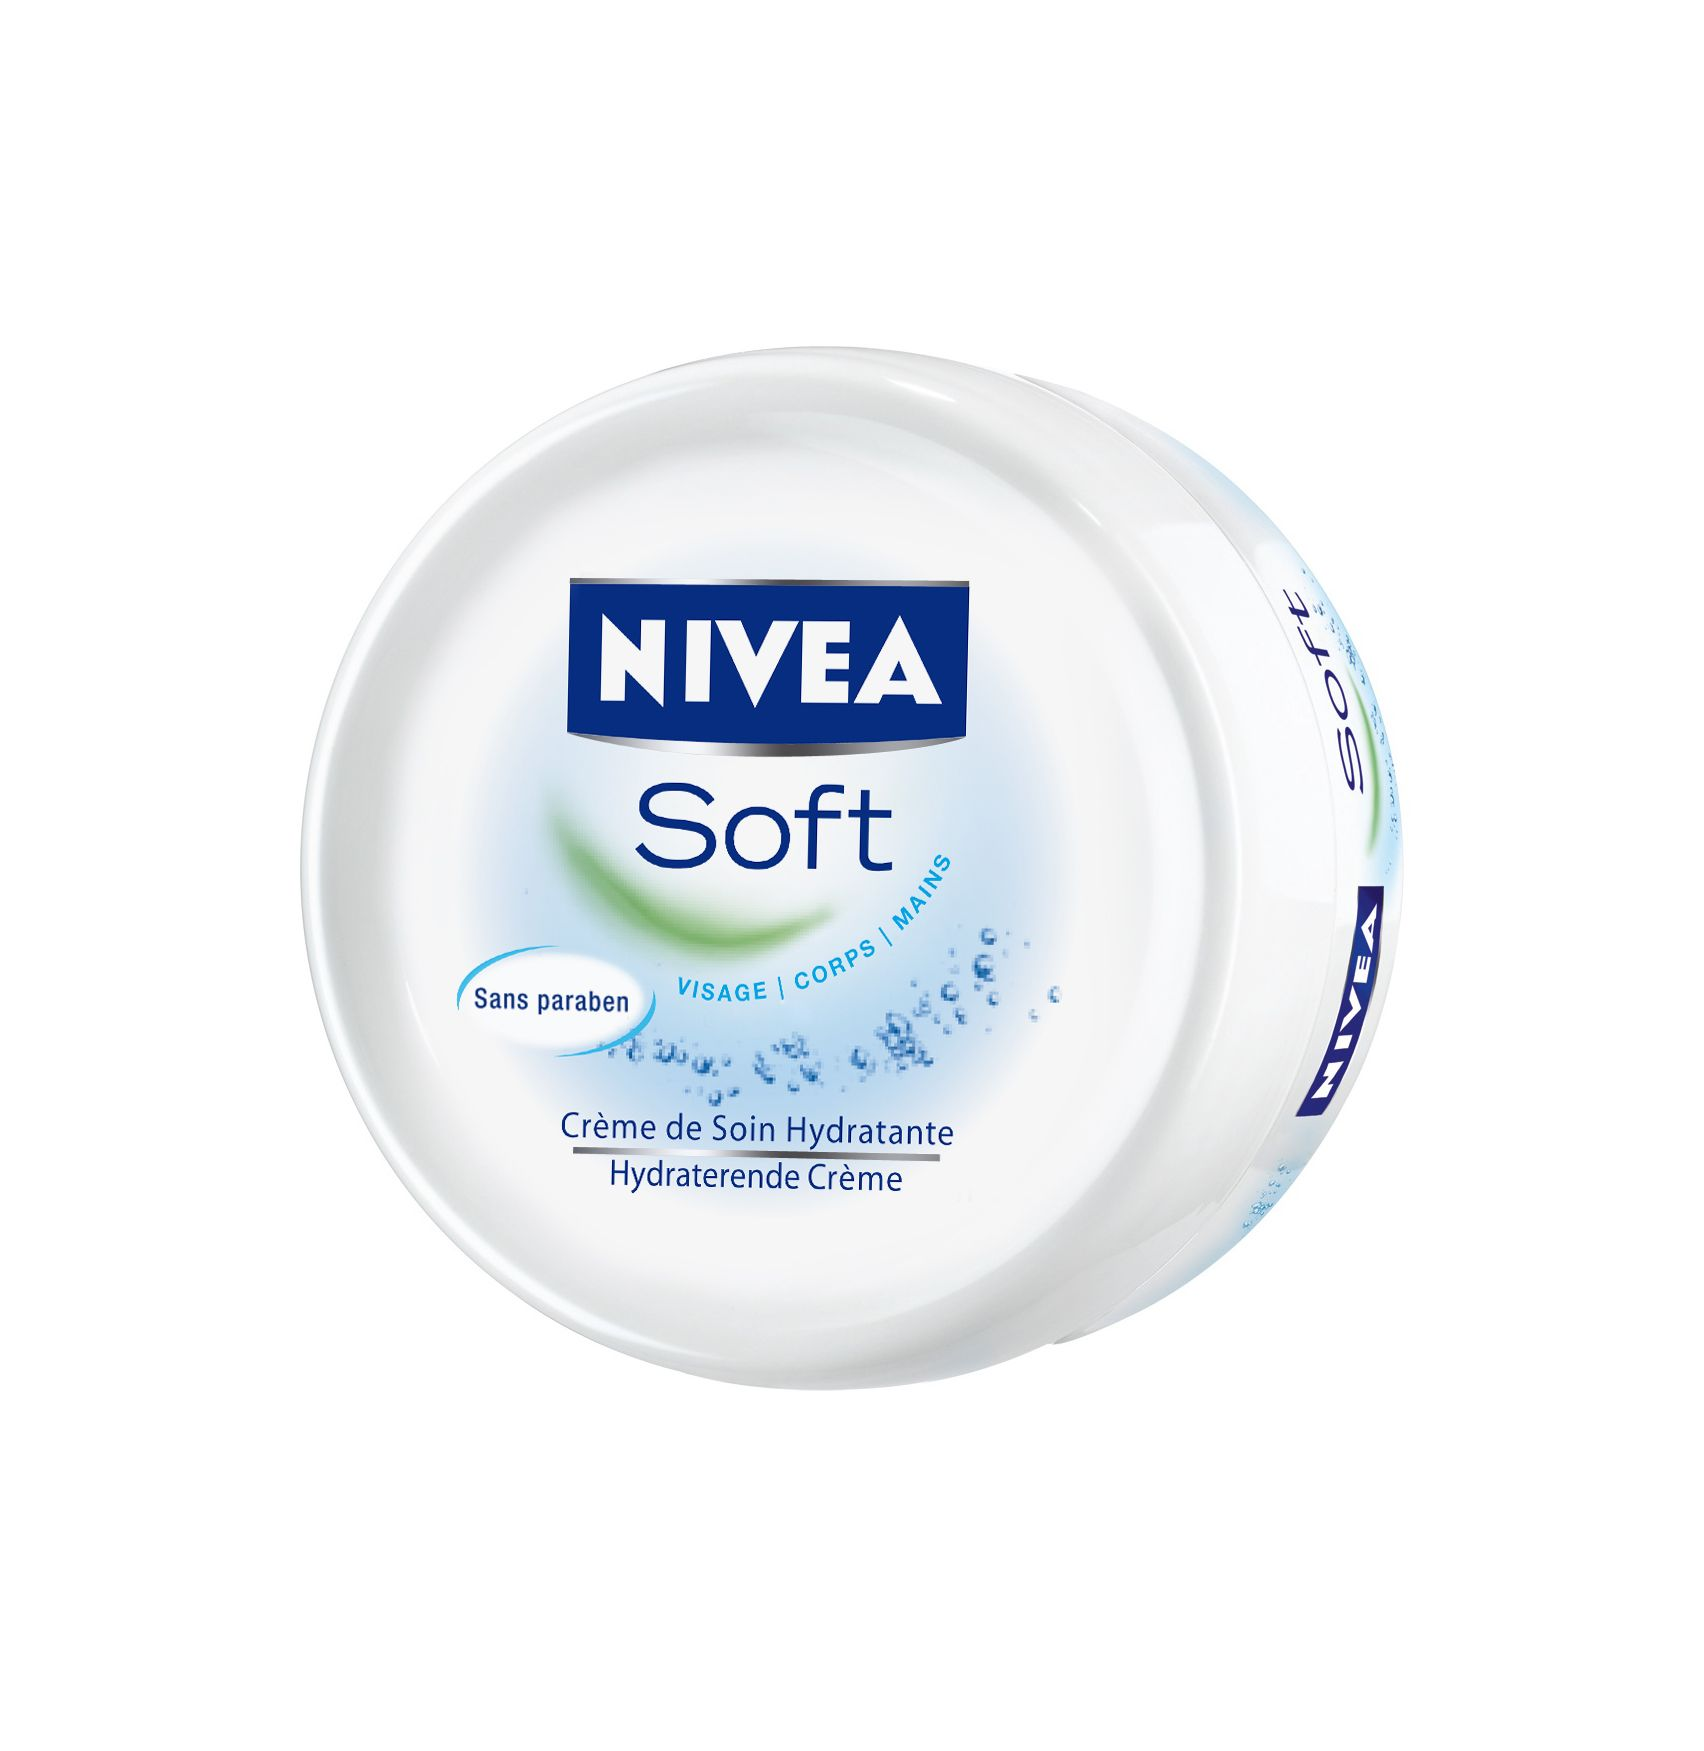 prix creme nivea soft